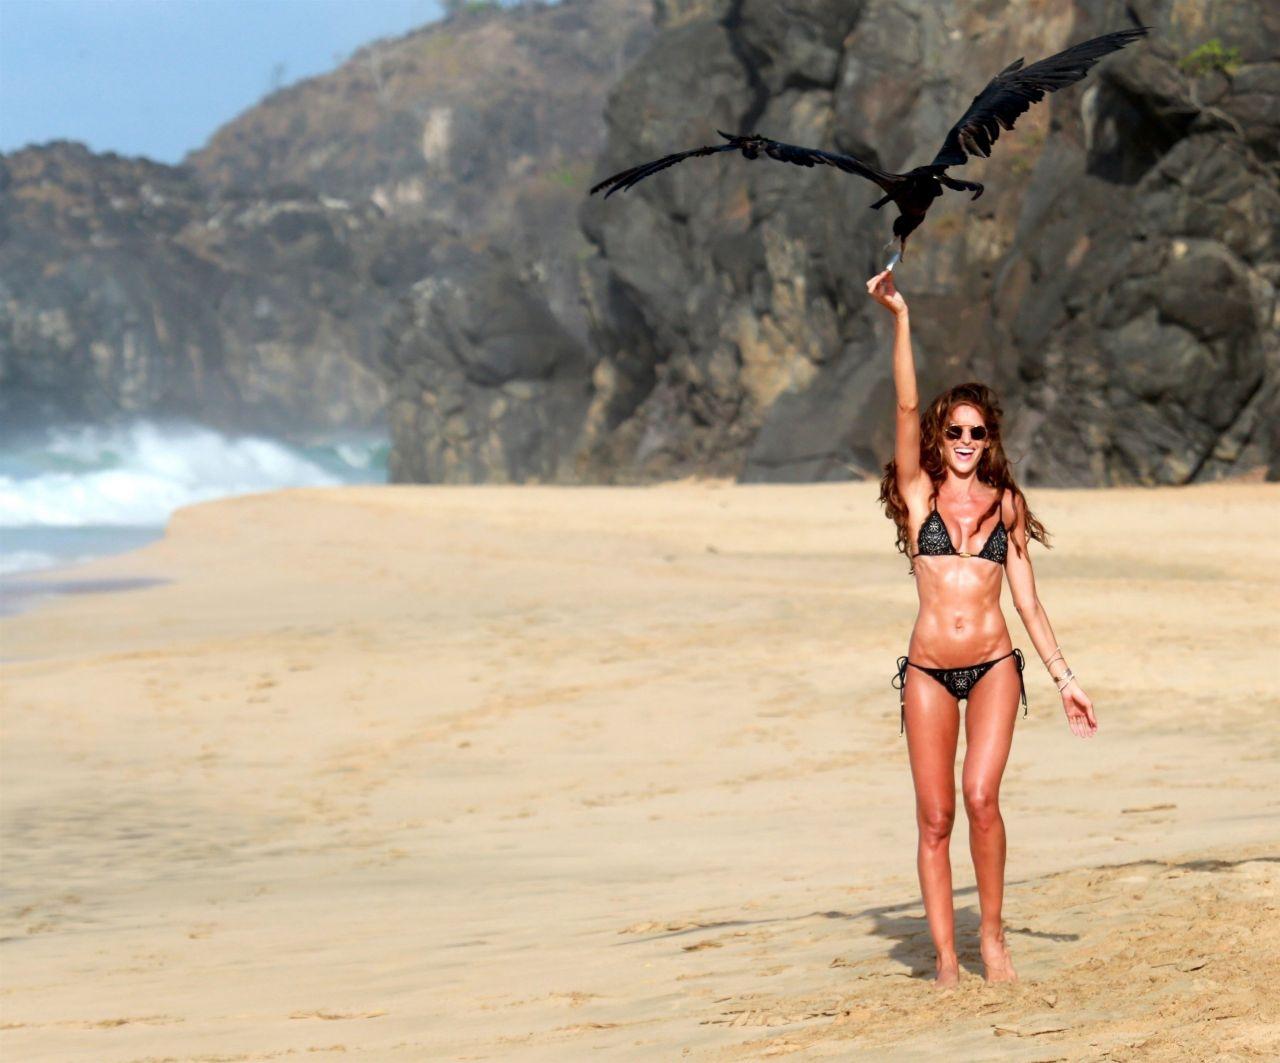 Izabel Goulart in Bikini at Cacimba Do Padre Beach in Fernando De Noronha Pic 2 of 35